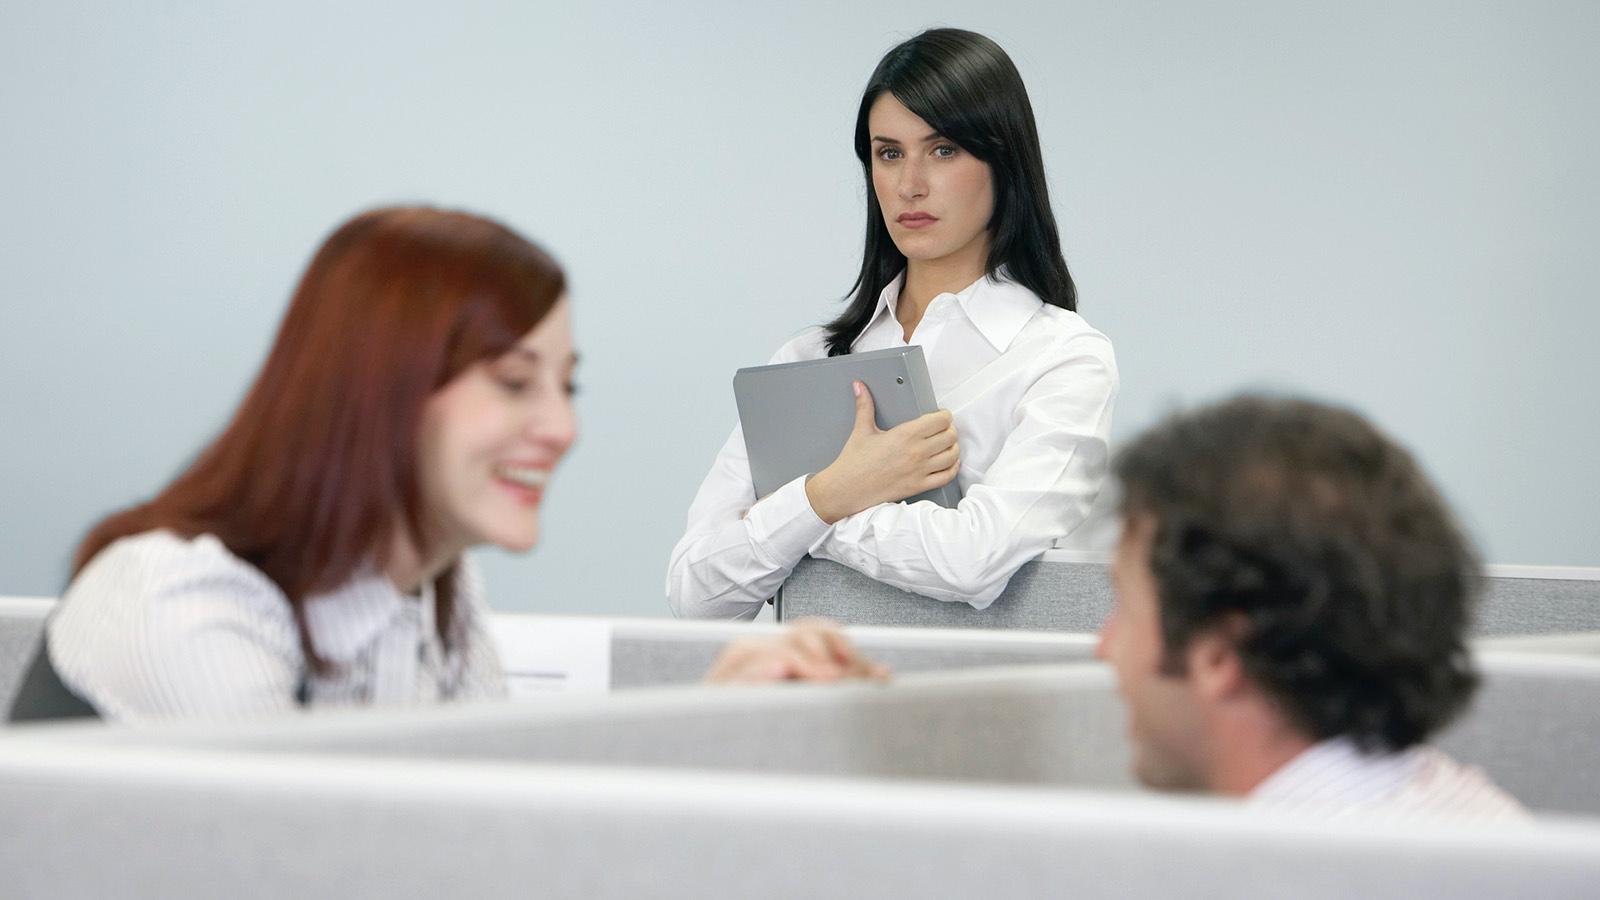 jealous coworker character flaw